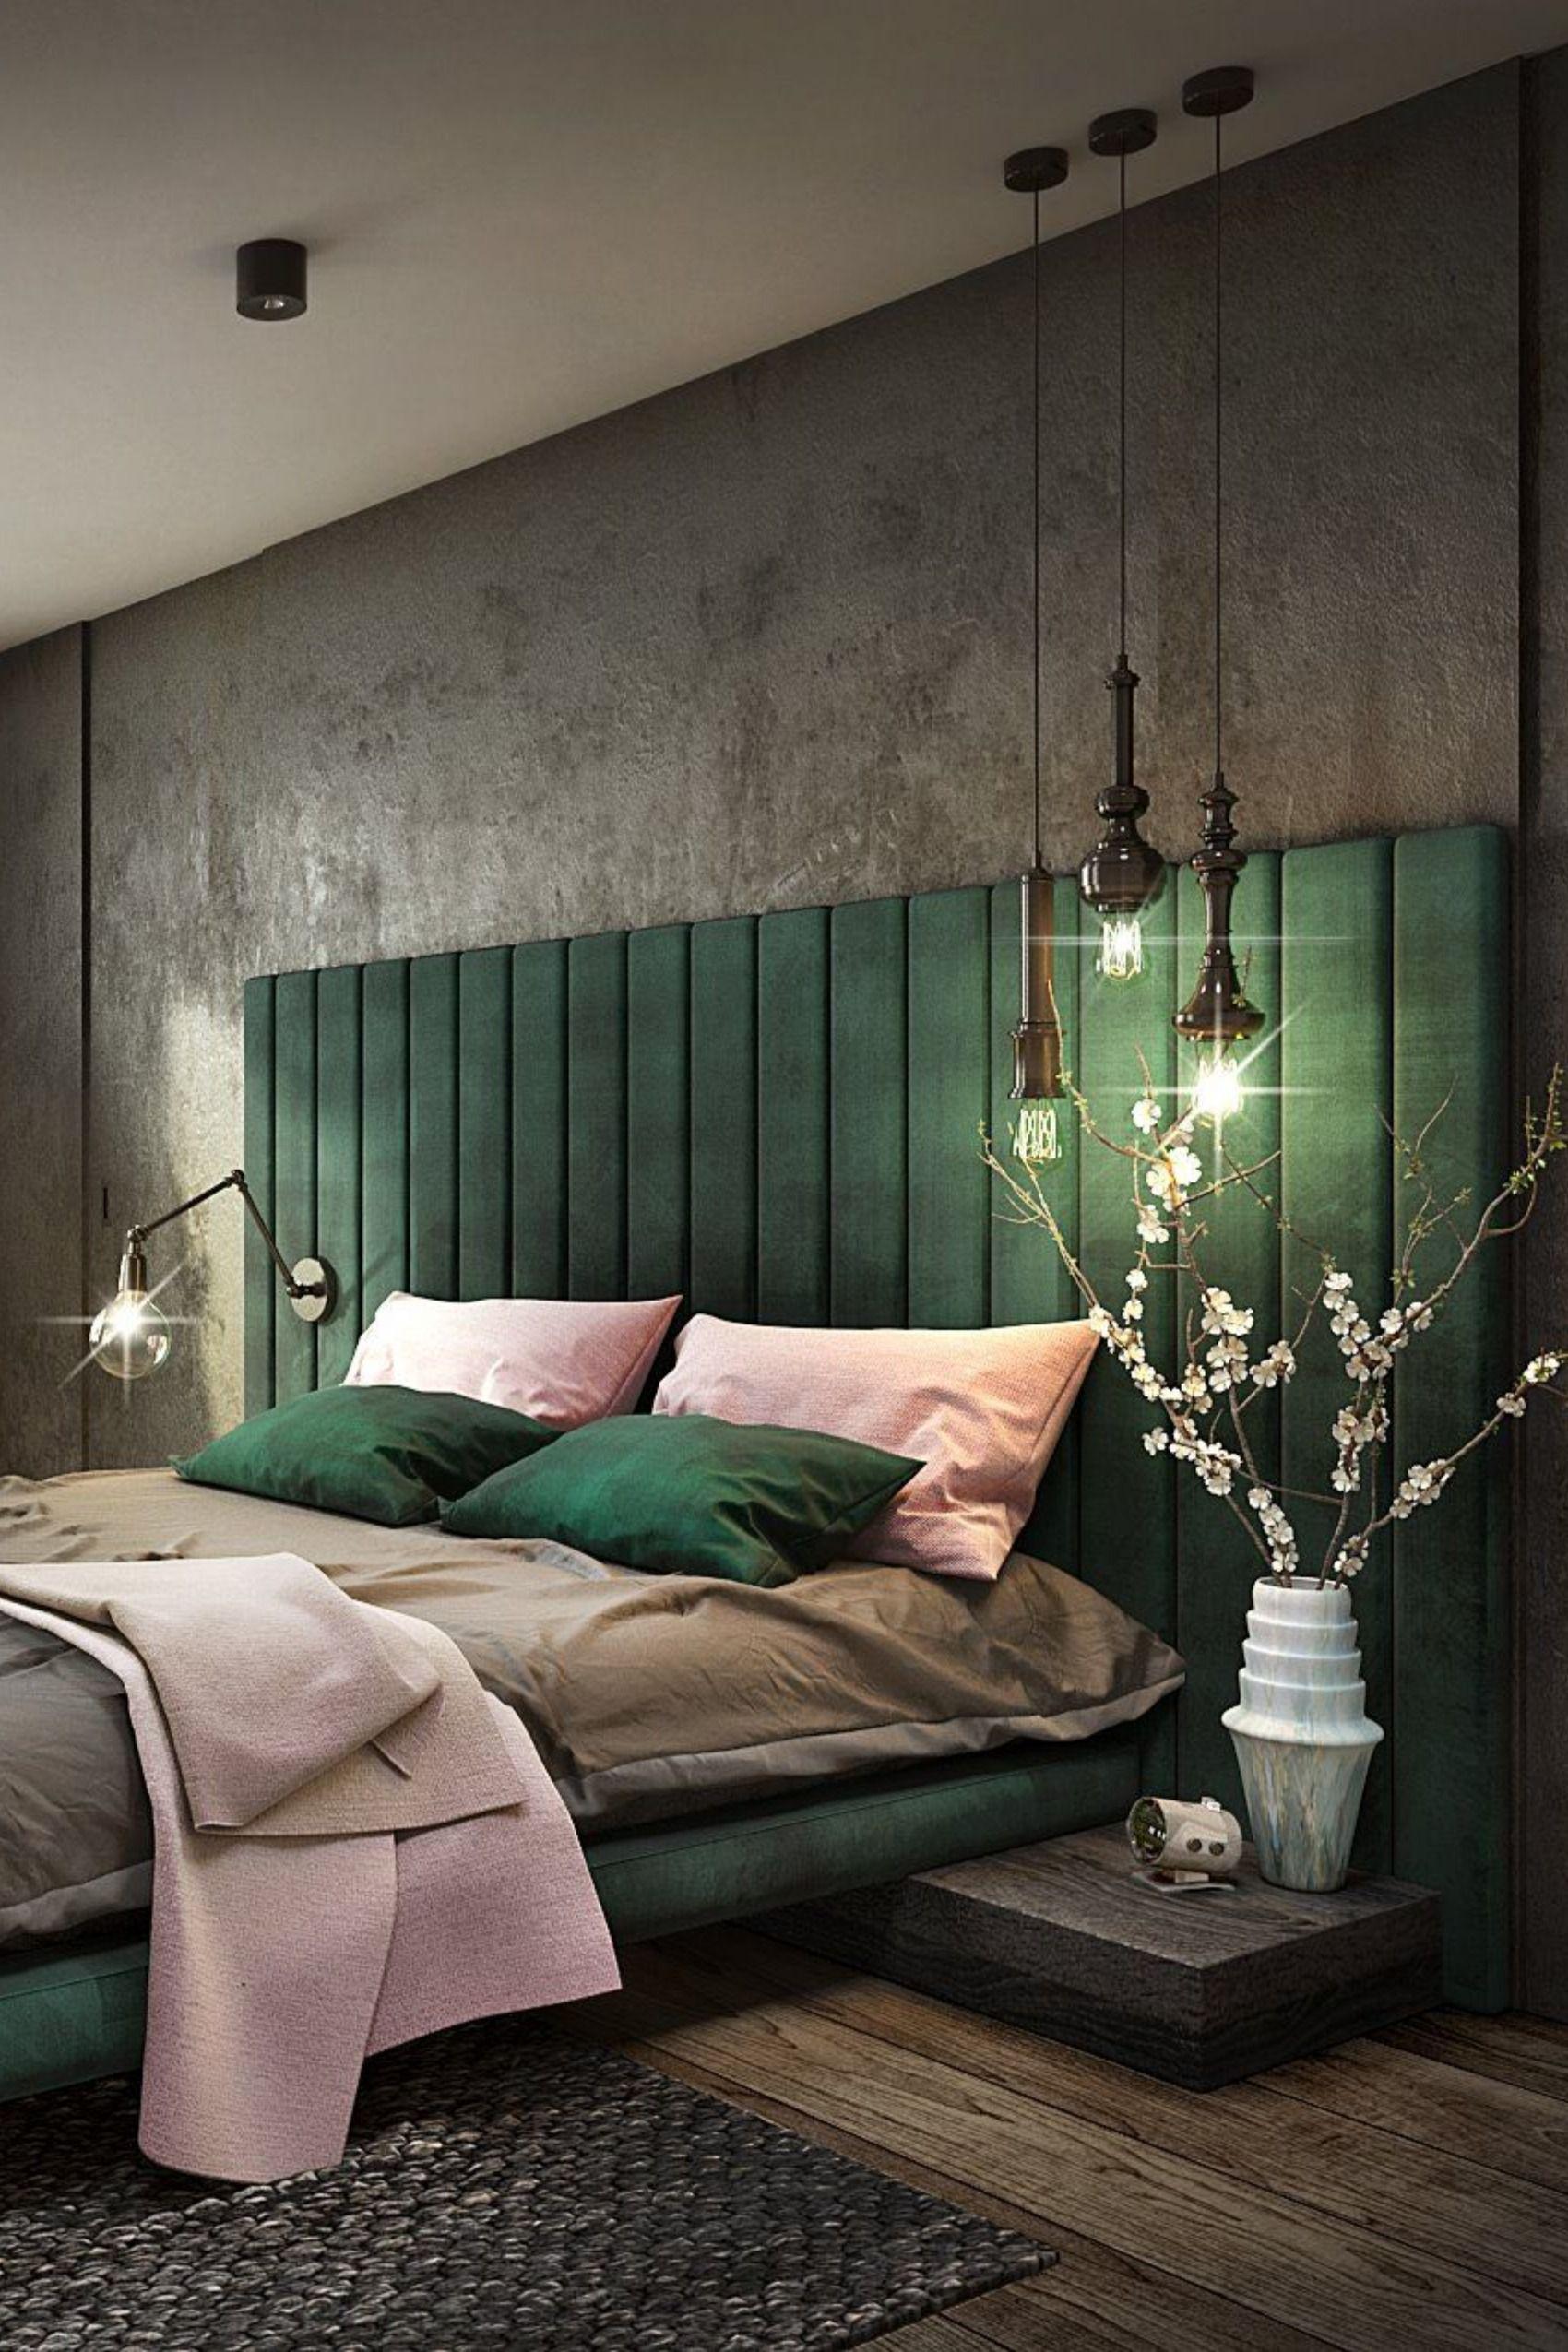 Bedroom Decor Ideas Bedroom Interior Design Hotel Interior